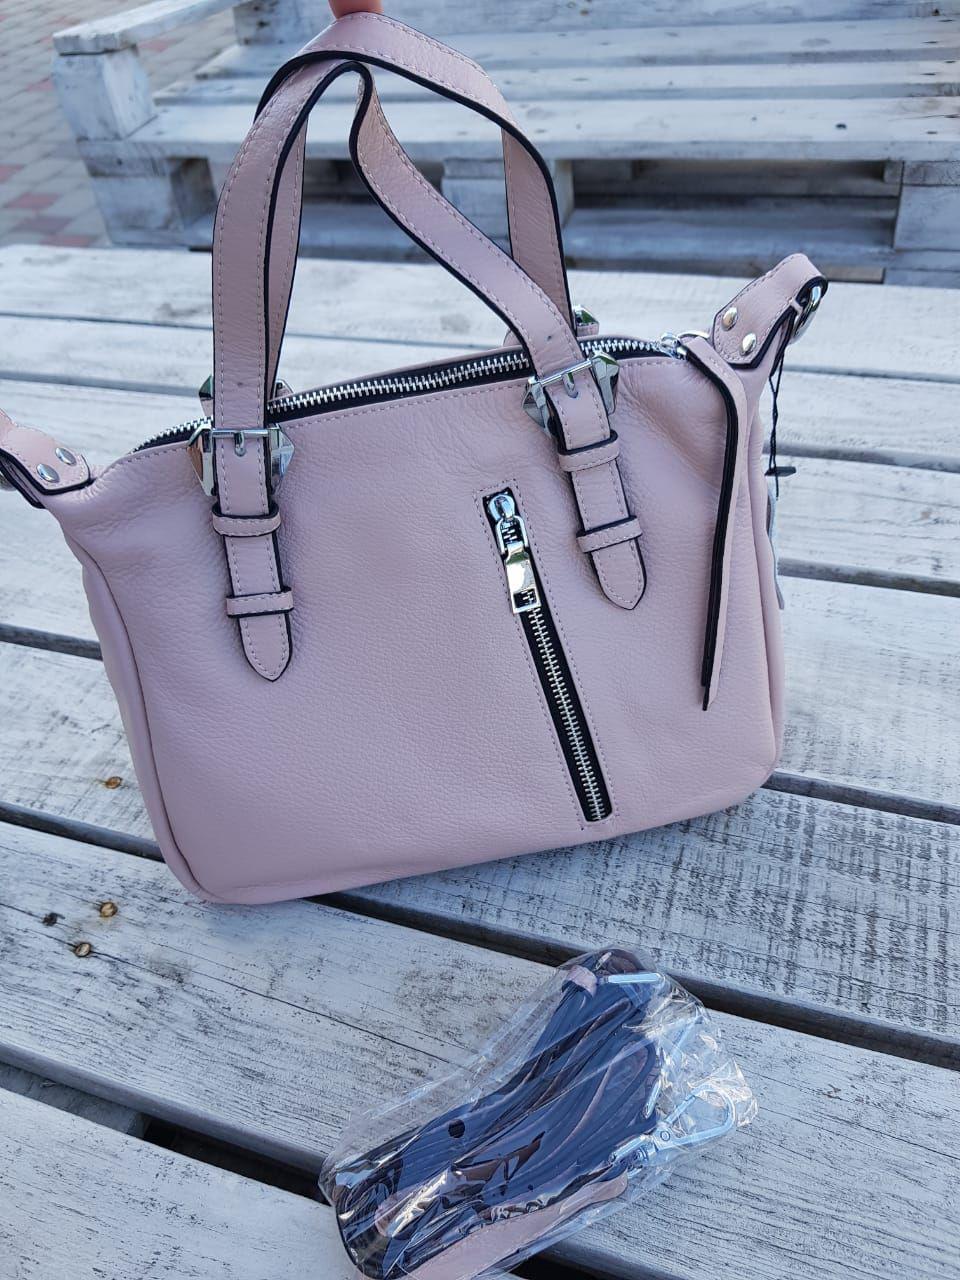 Кожаная женская сумка размером 27х21х12 см Розовая